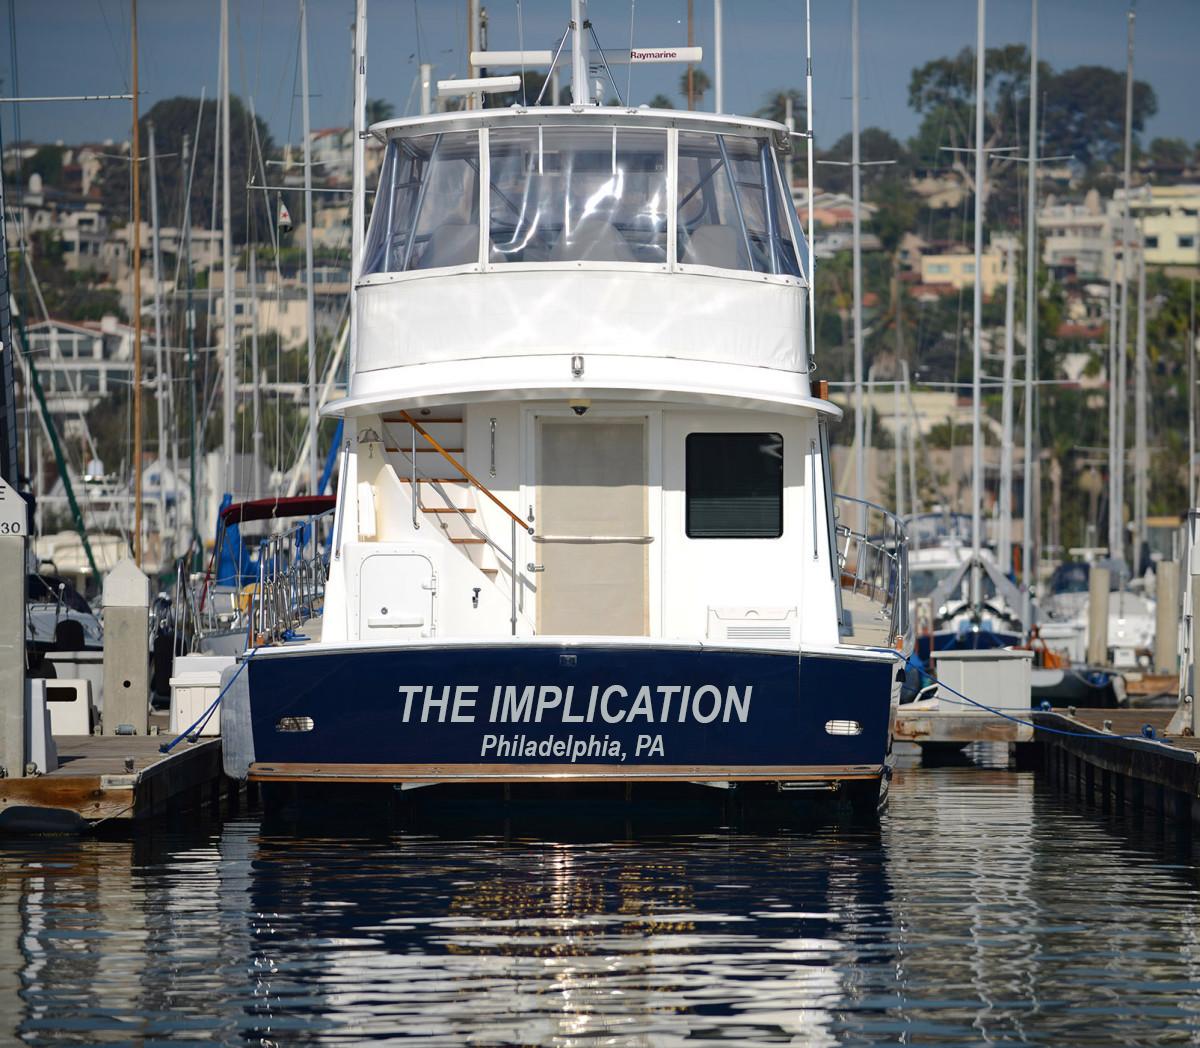 Found the Dennis' boat.